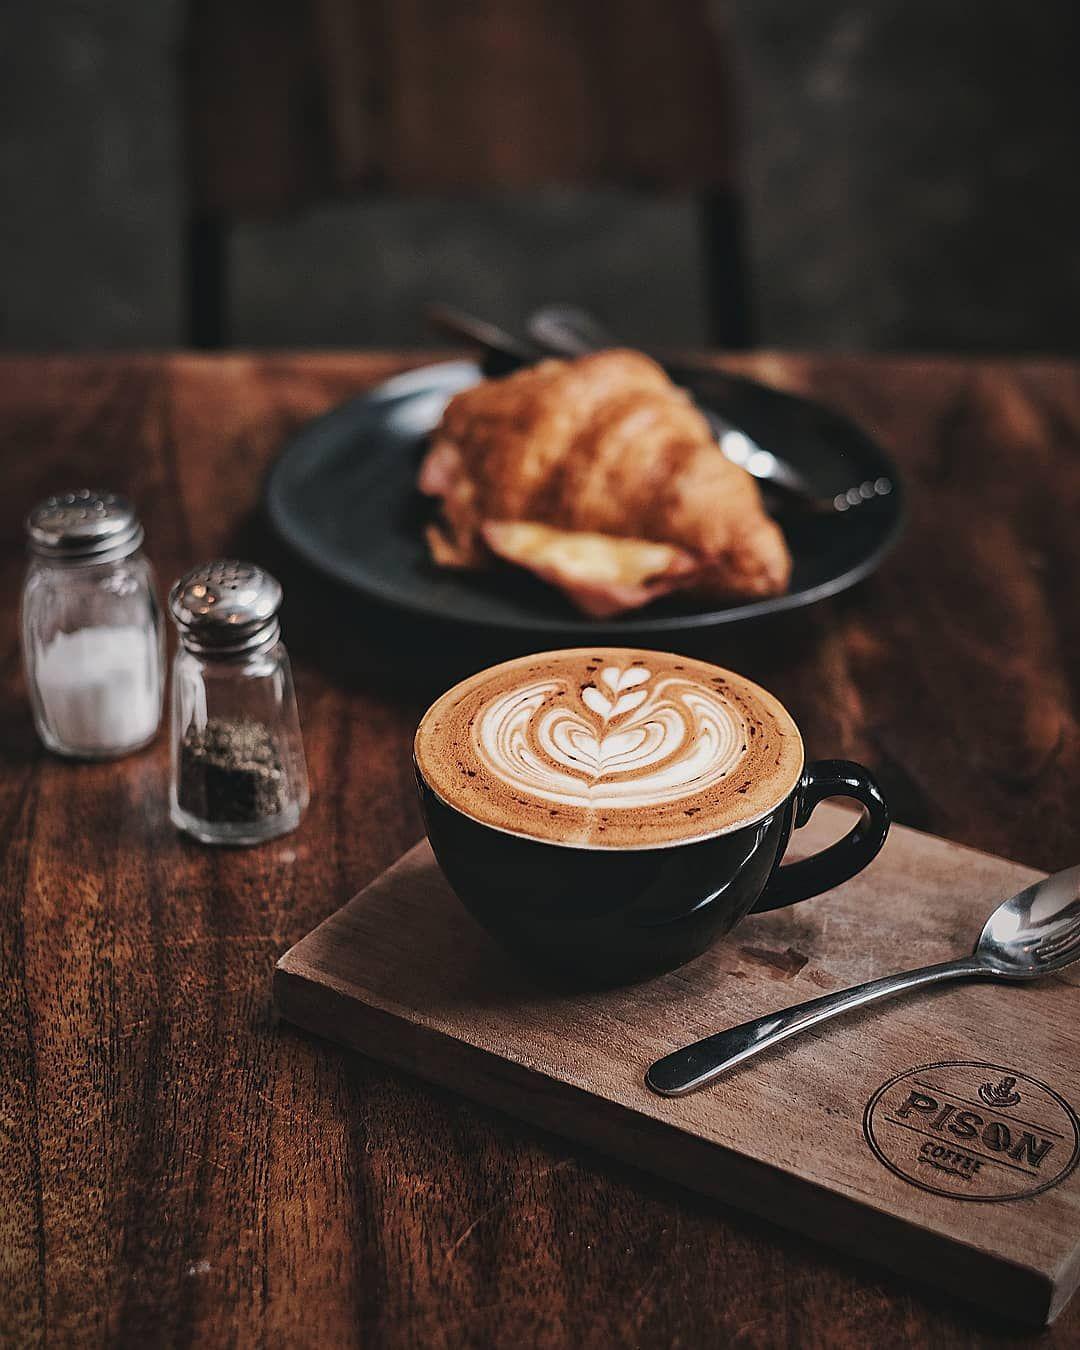 Riswandi Wansyah On Instagram That One Decent Coffee Shop